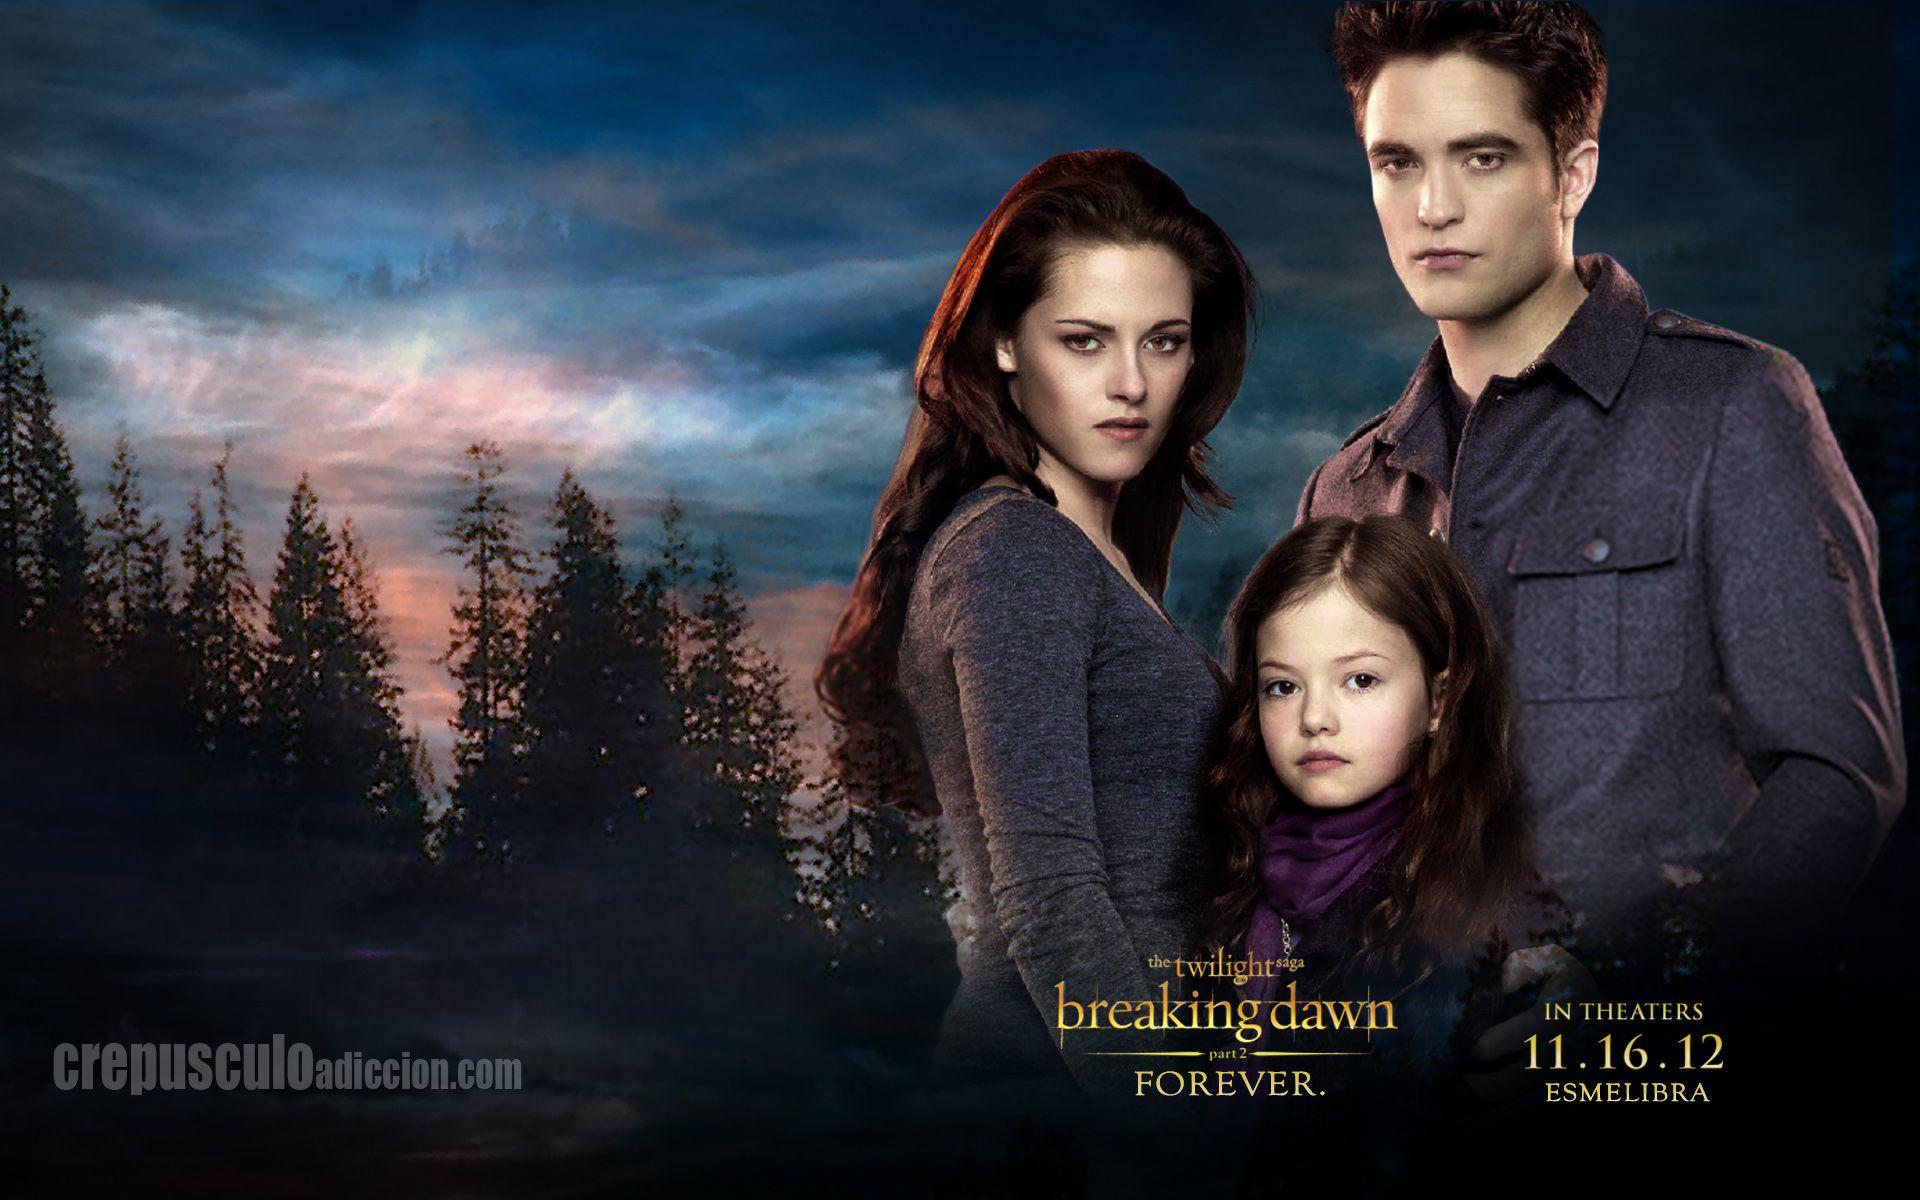 Twilight Series Wallpaper Breaking Dawn Part 2 Wallpaper Twilight Breaking Dawn Twilight Movie Twilight